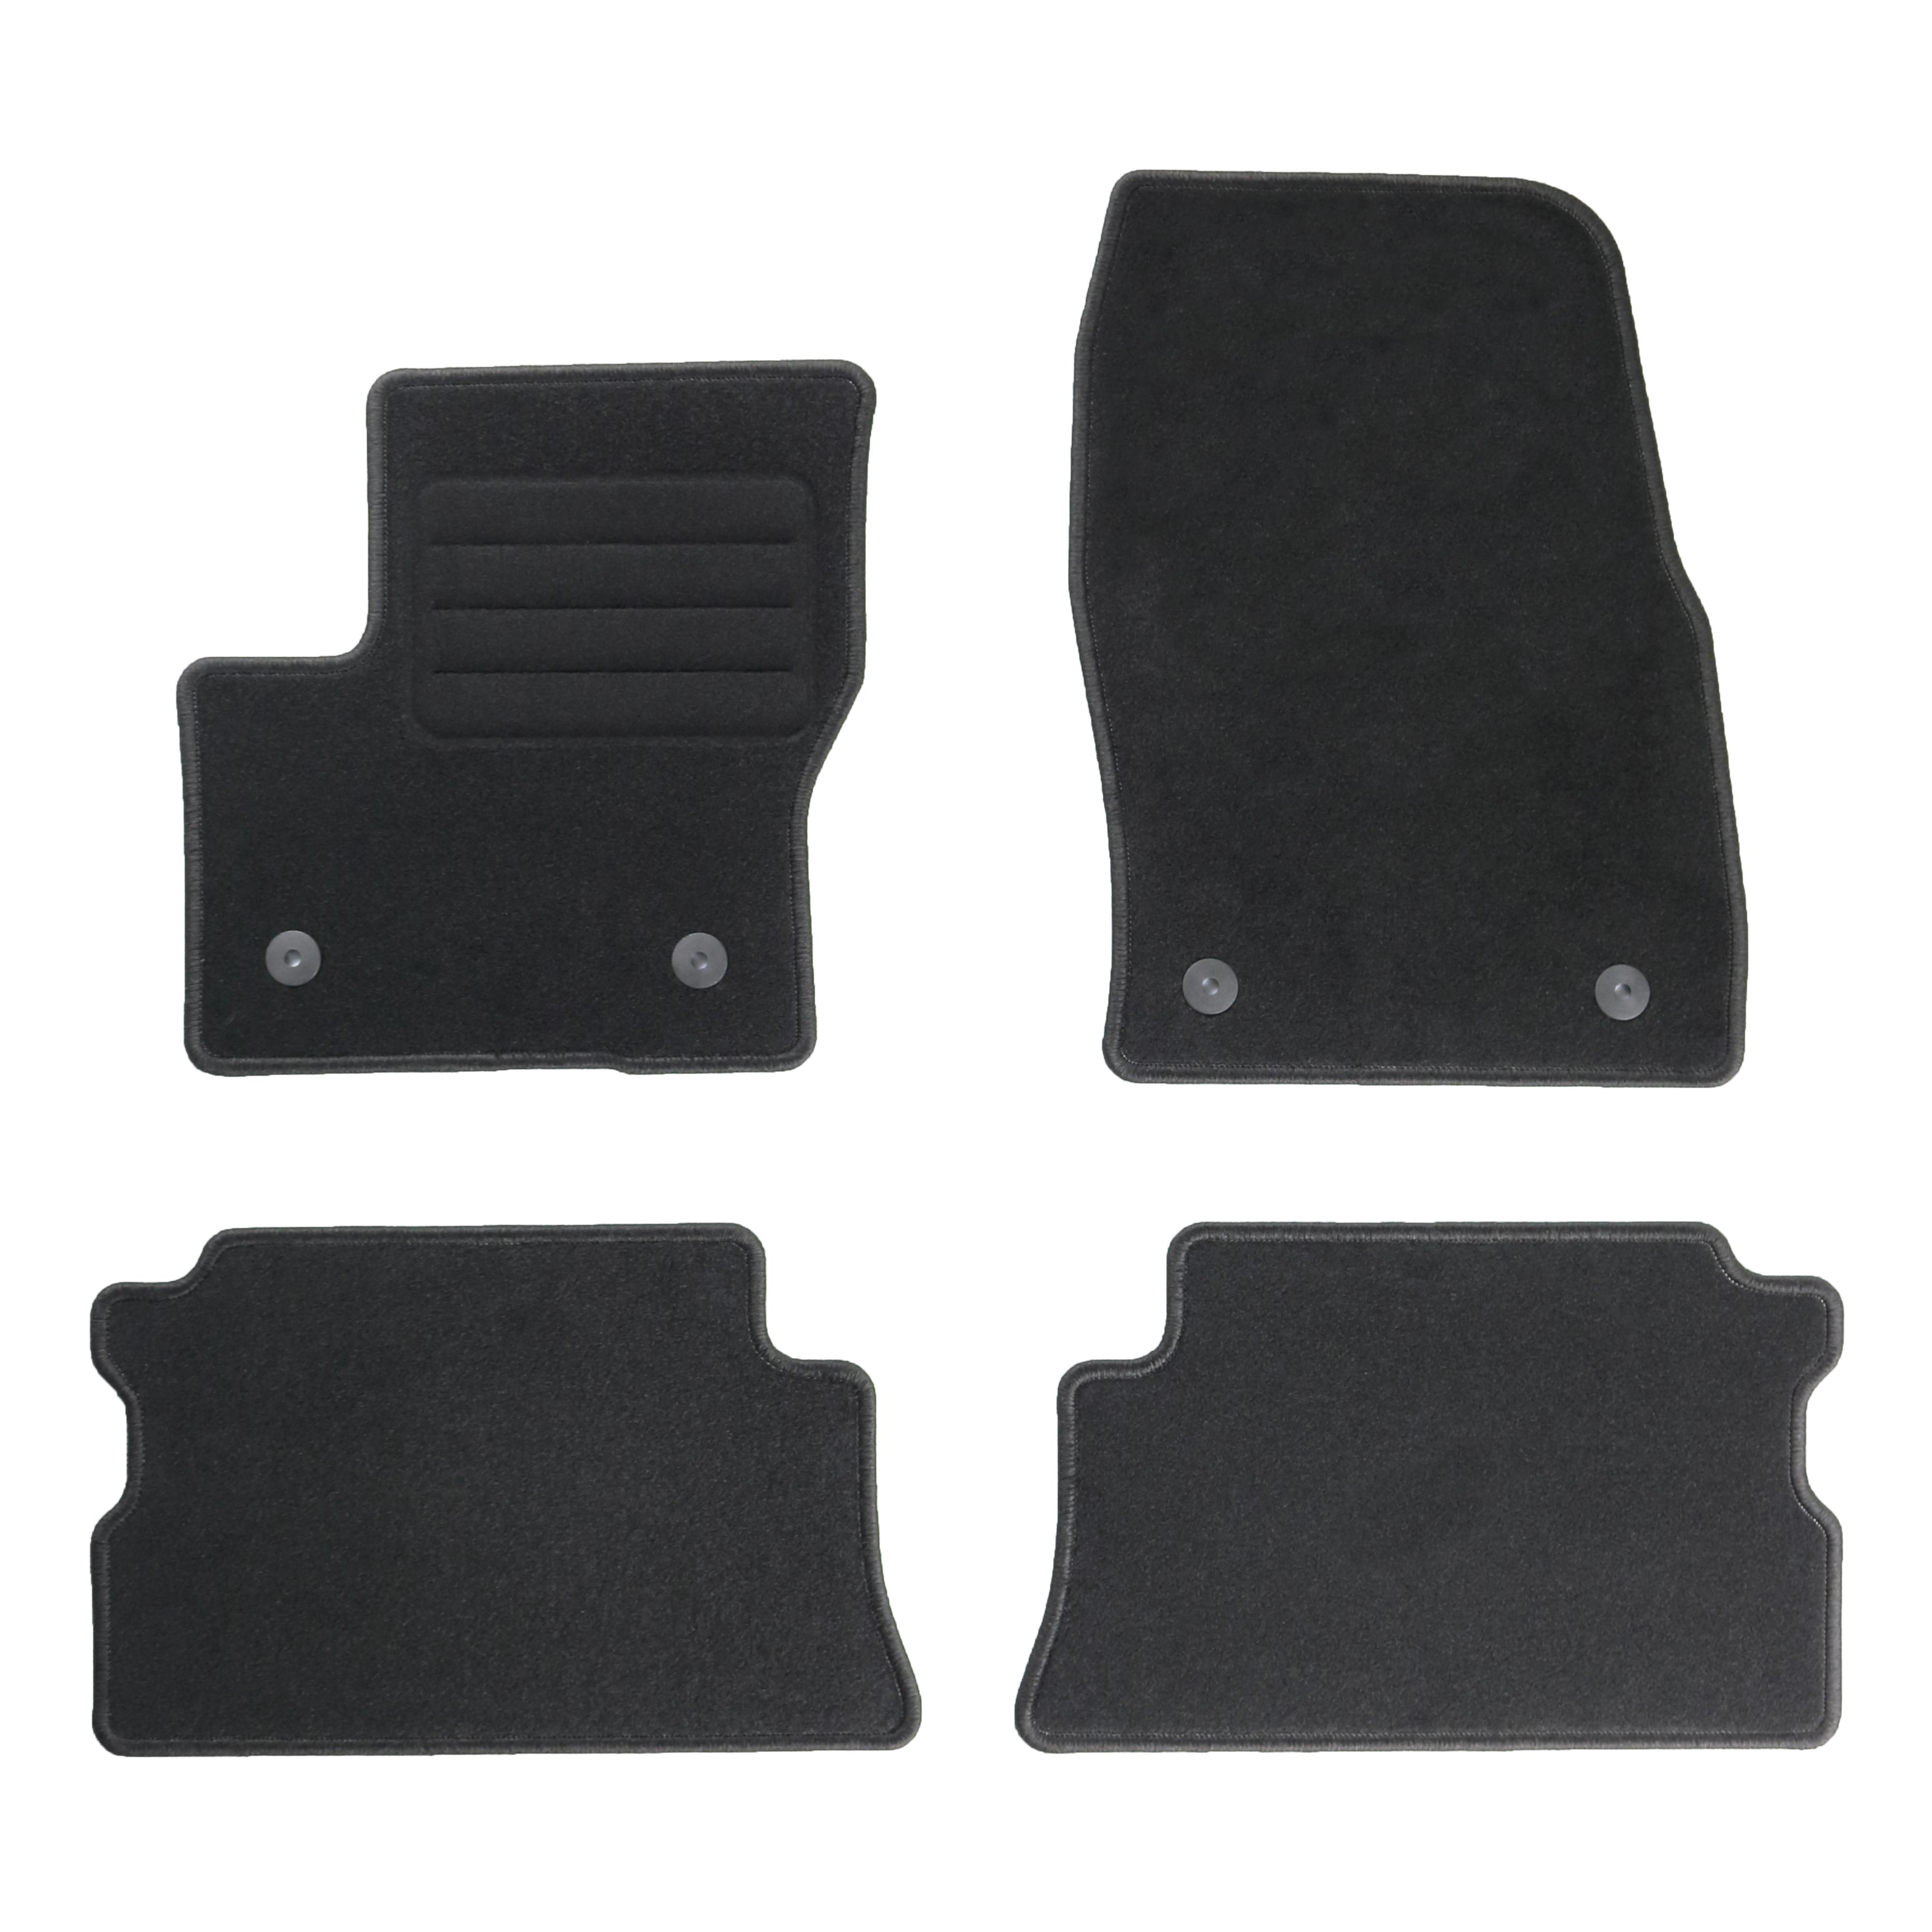 ford kuga ii fu matten autoteppiche bj 2012 ebay. Black Bedroom Furniture Sets. Home Design Ideas